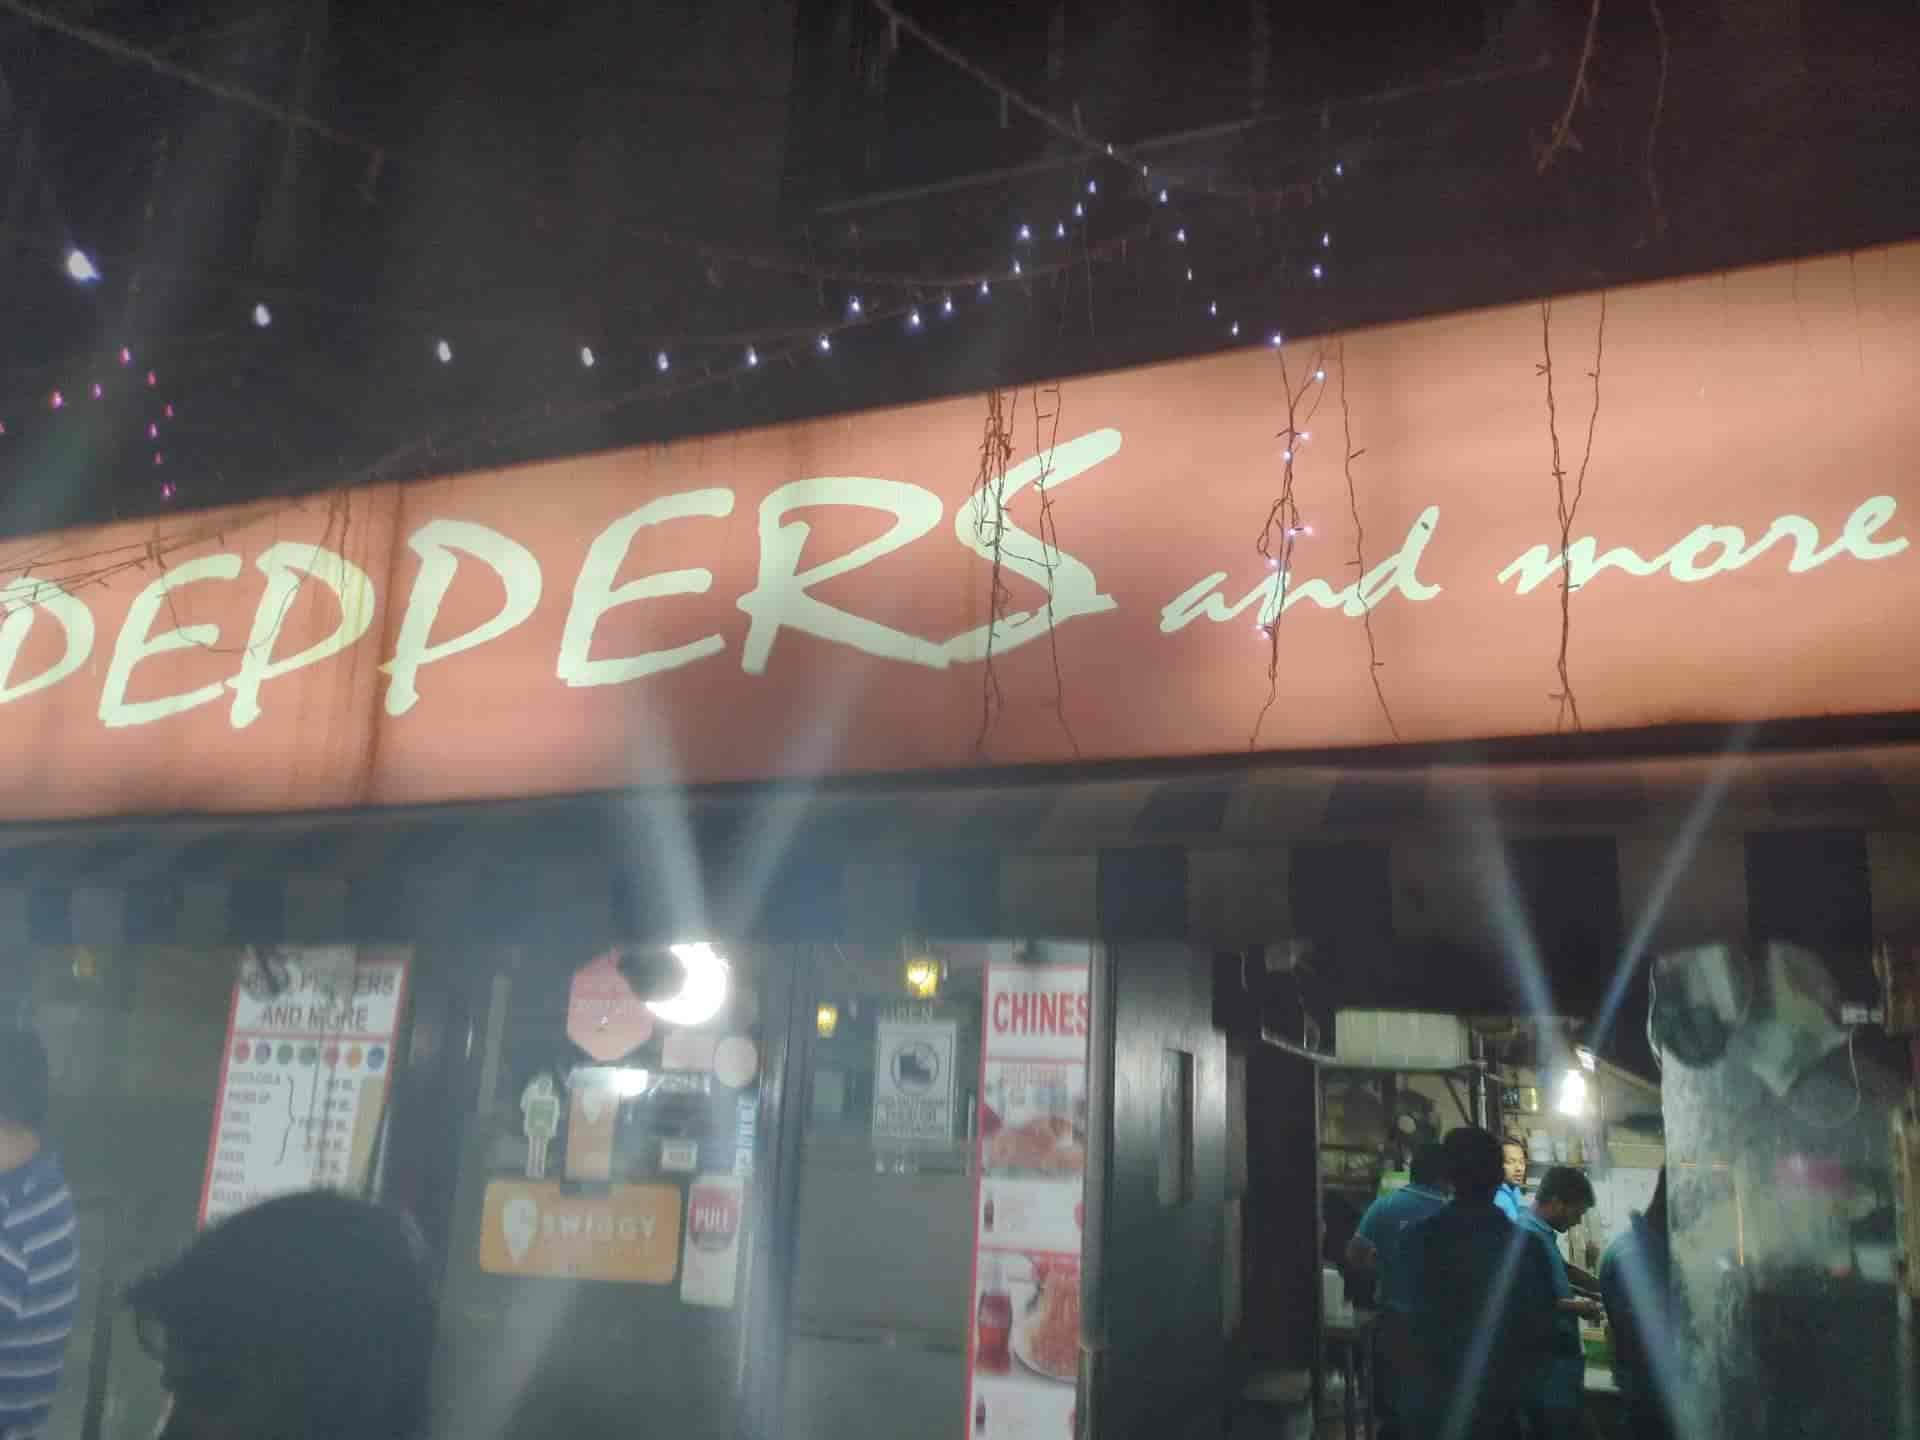 Bell Peppers, East Kolkata Township, Kolkata - Chinese, North Indian